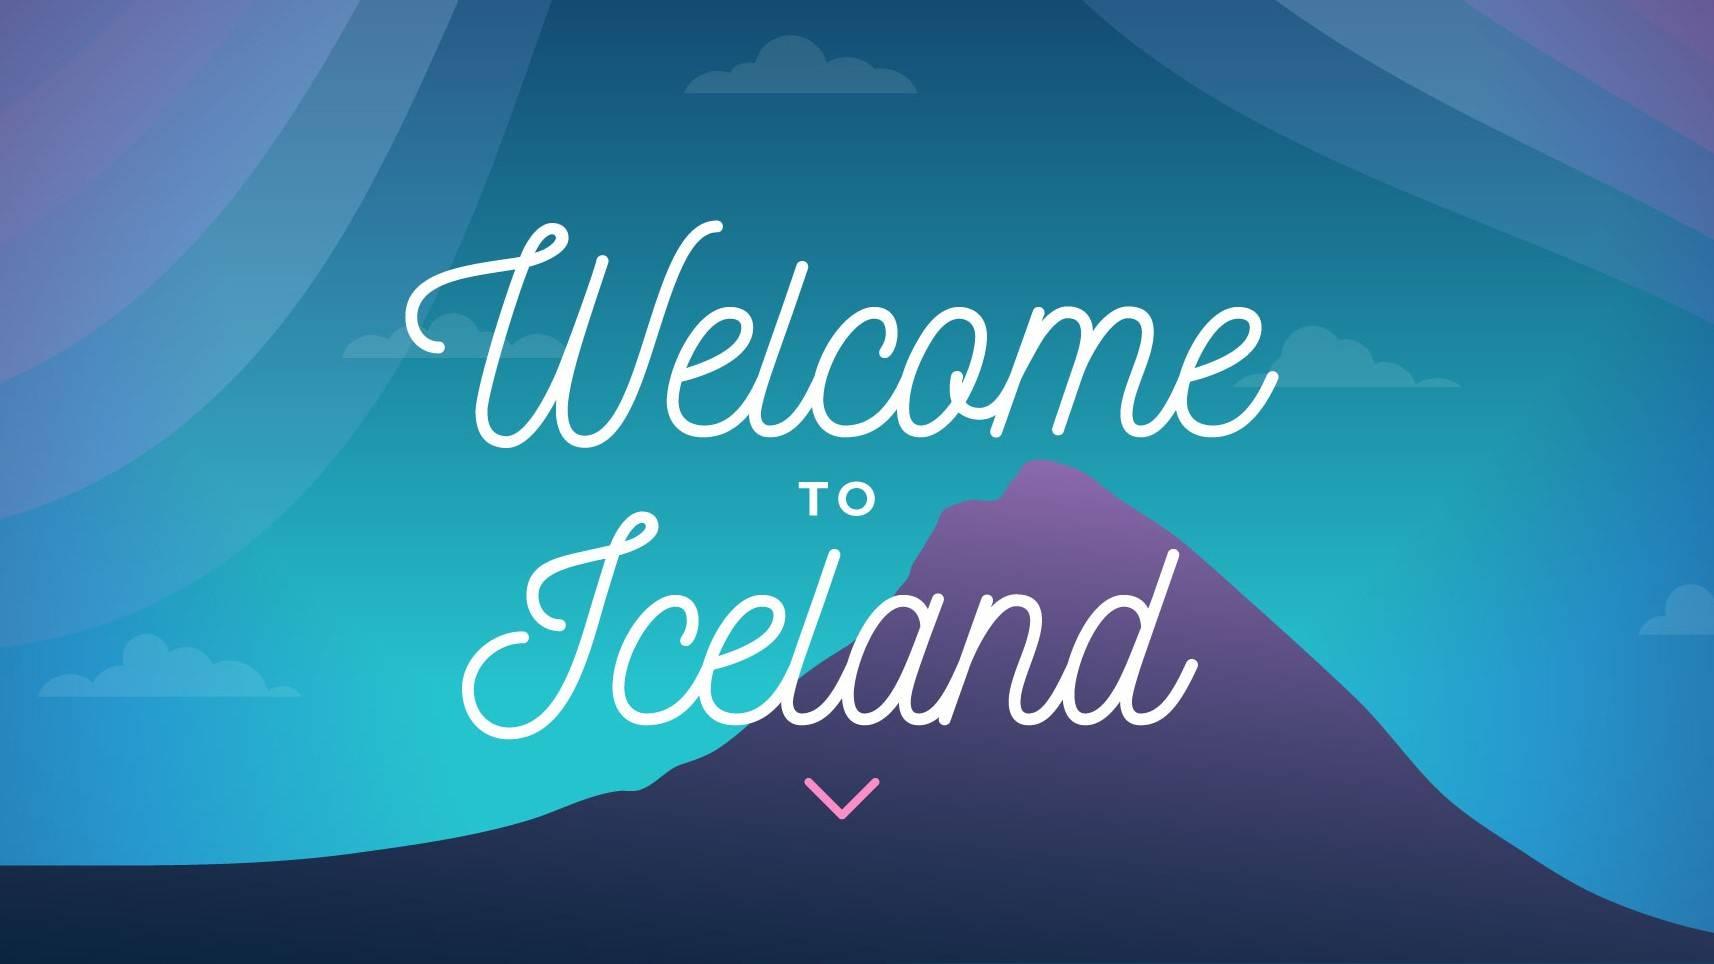 VerneGlobal为冰岛数据中心扩张筹集2700万美元